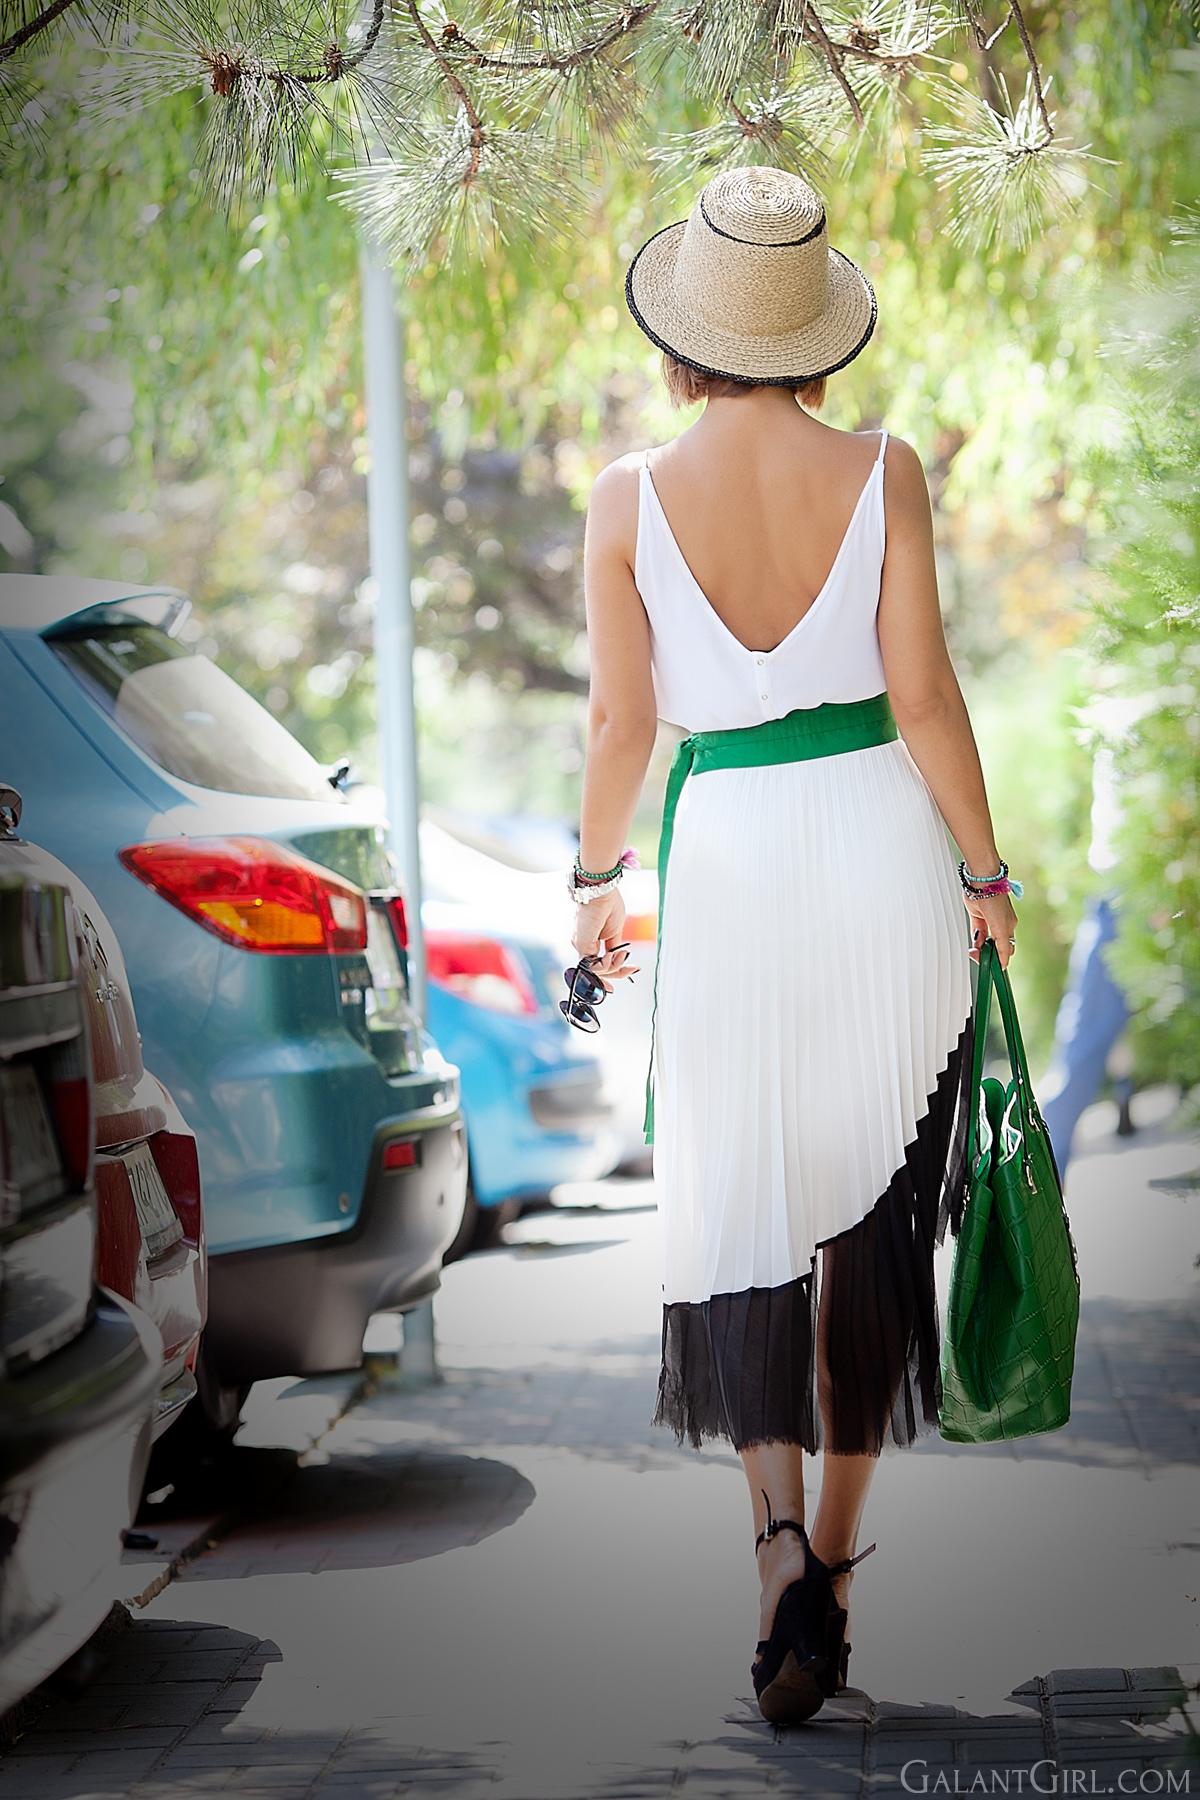 chic-style-fashion-blogger-galantgirl